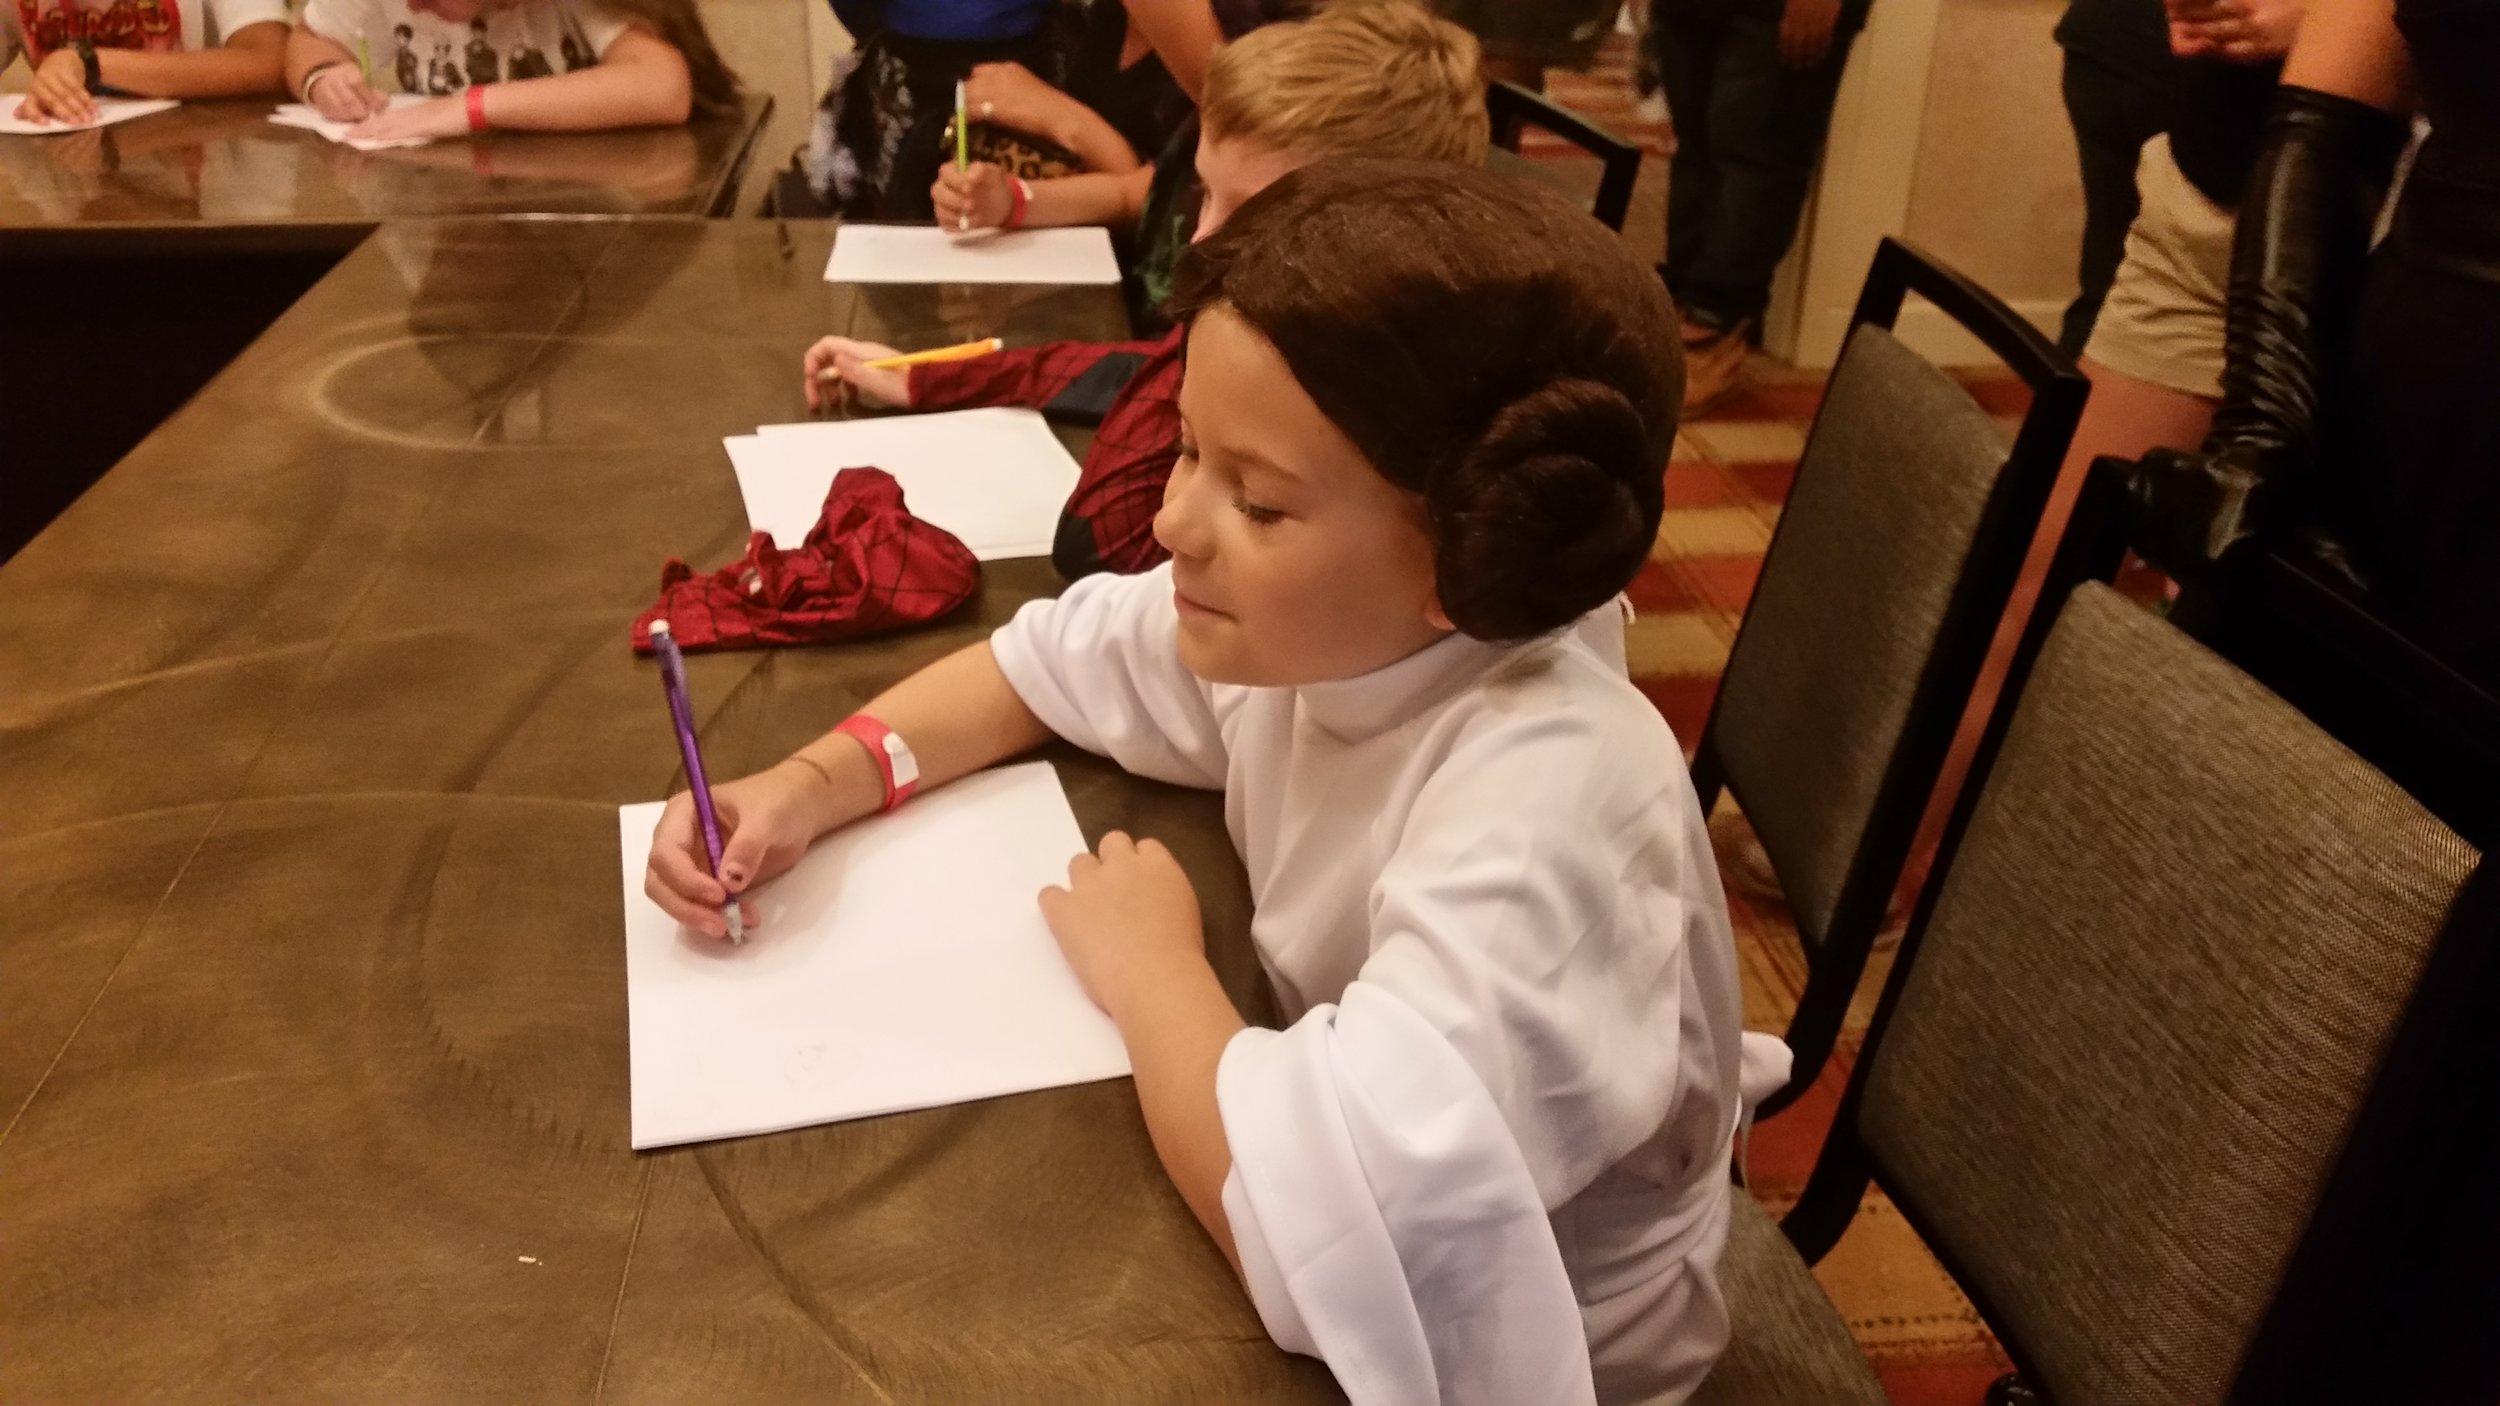 A Princess Leia Cosplayer draws a fox during Keir Lyles